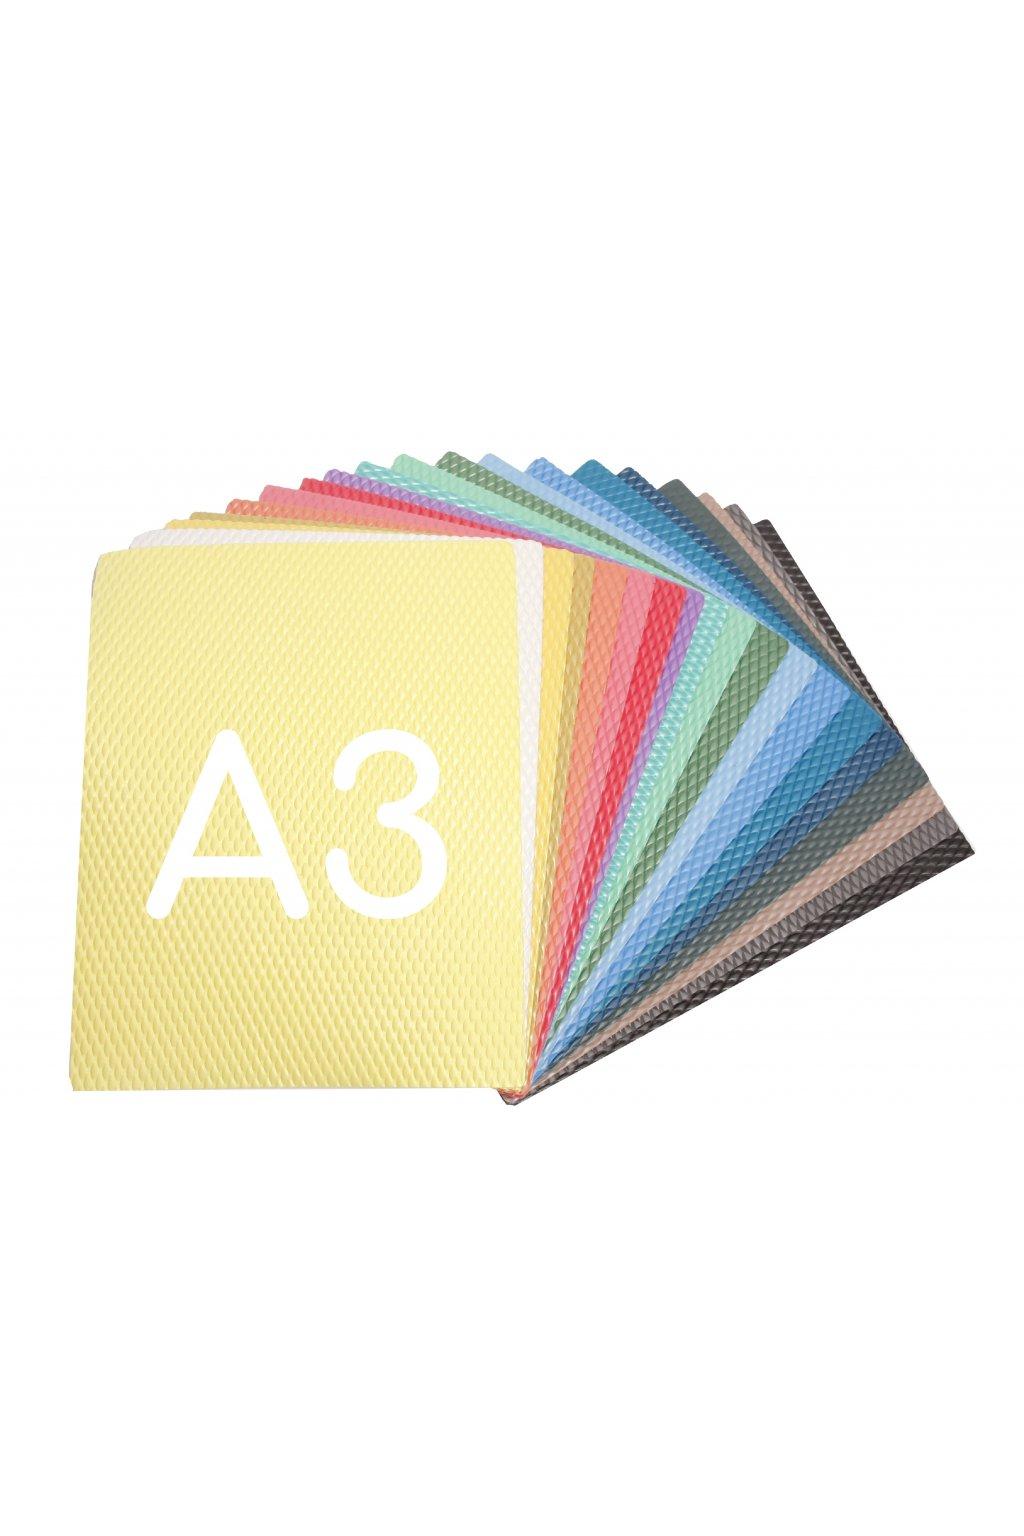 a3 papir s reliefem